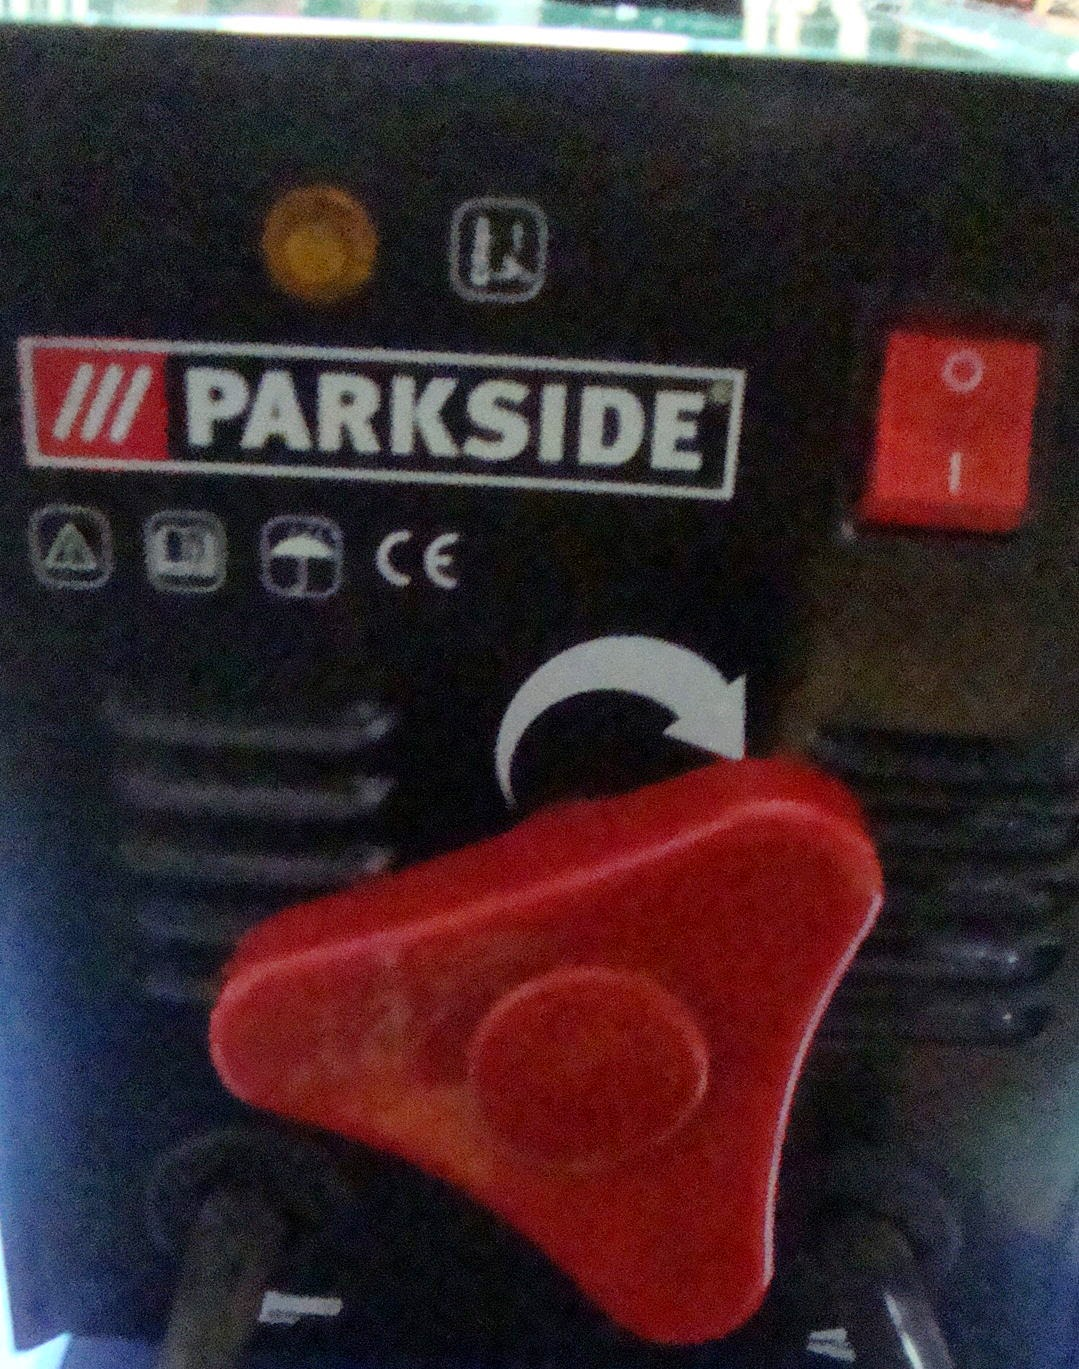 parkside pesg 120 a1